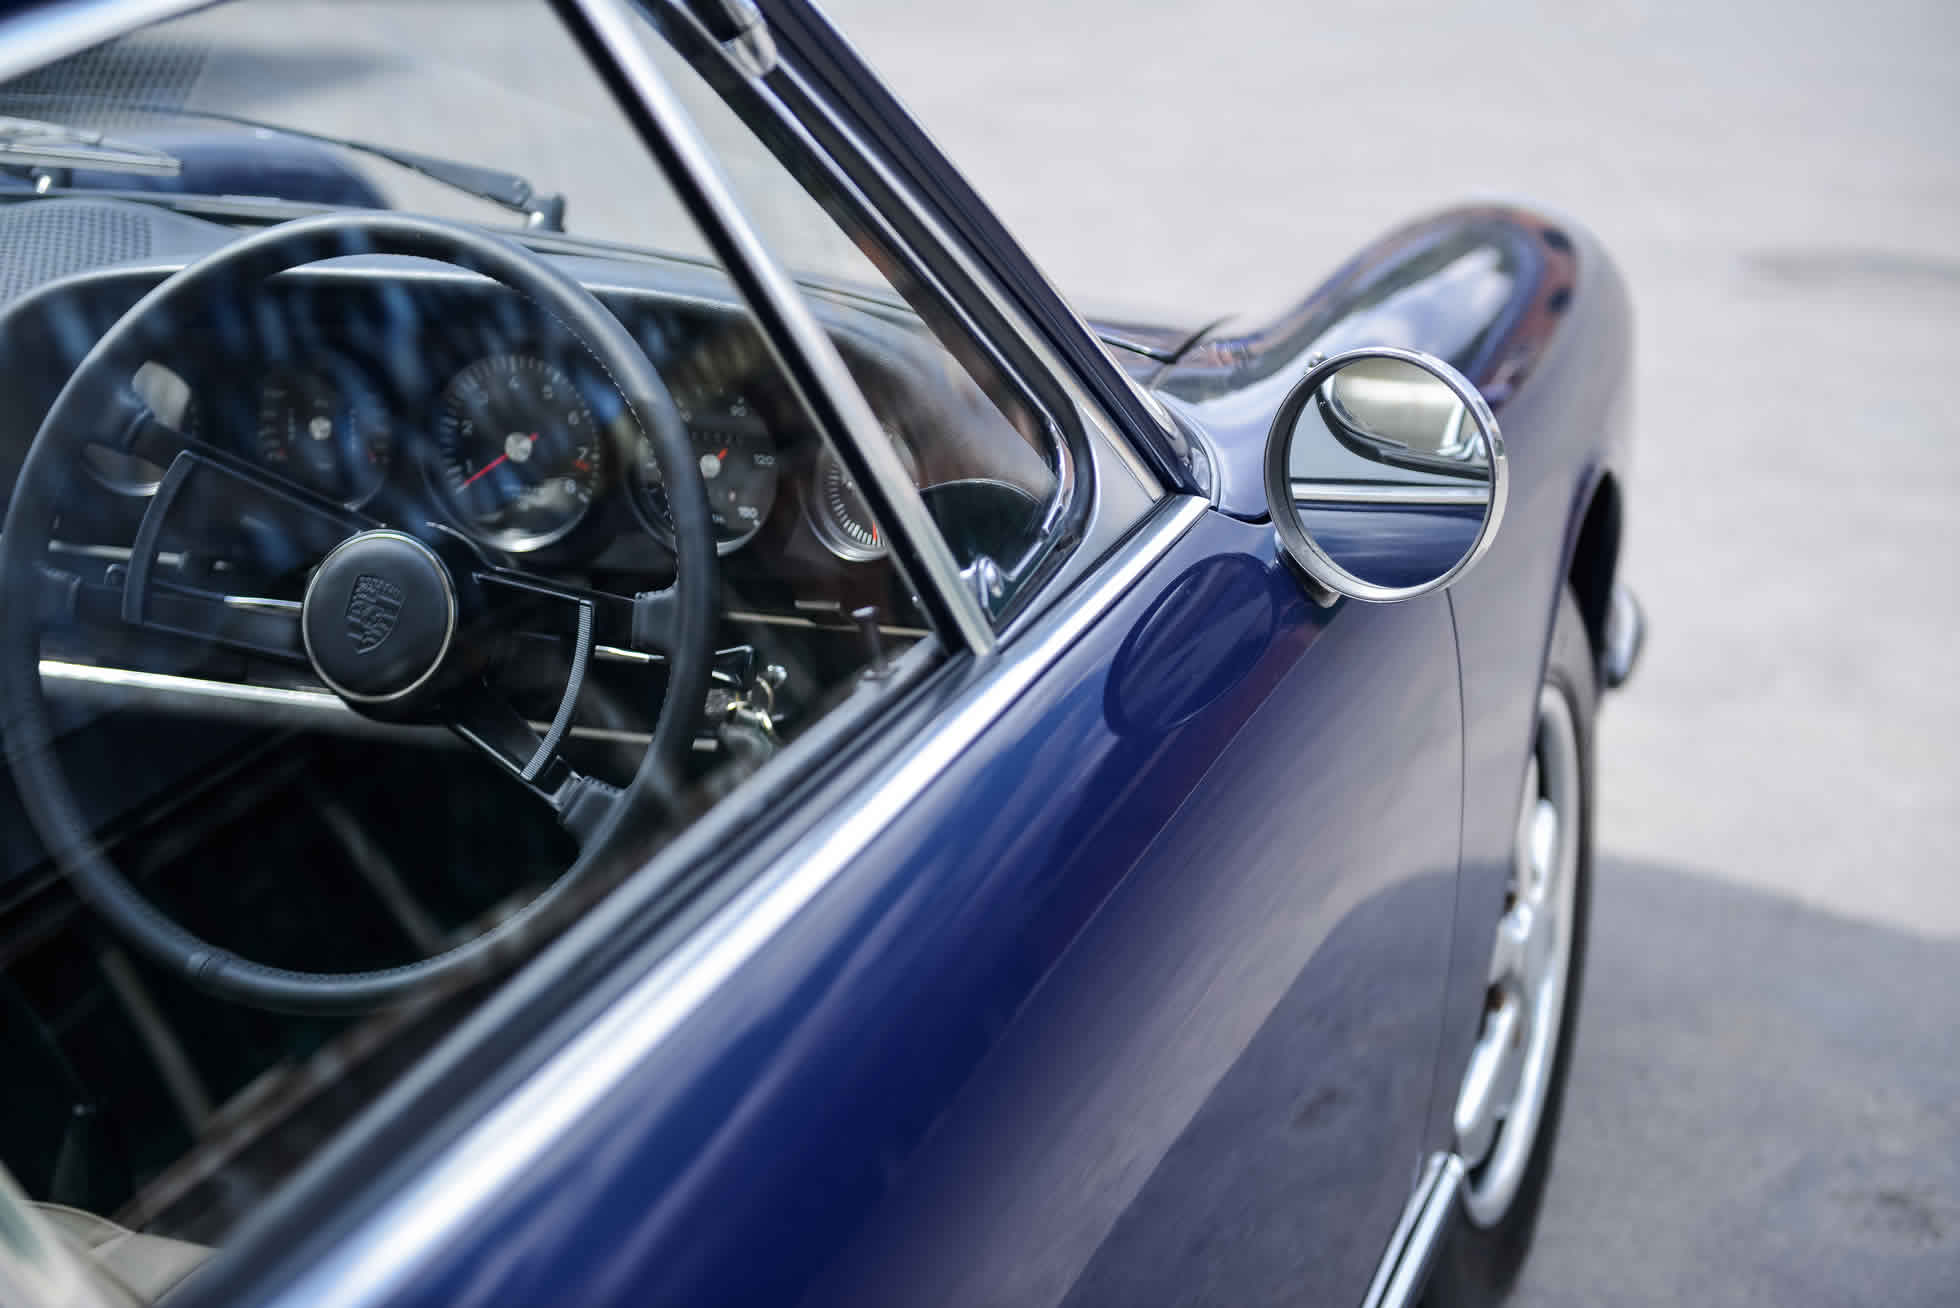 For Sale 1968 Porsche 911 S side view